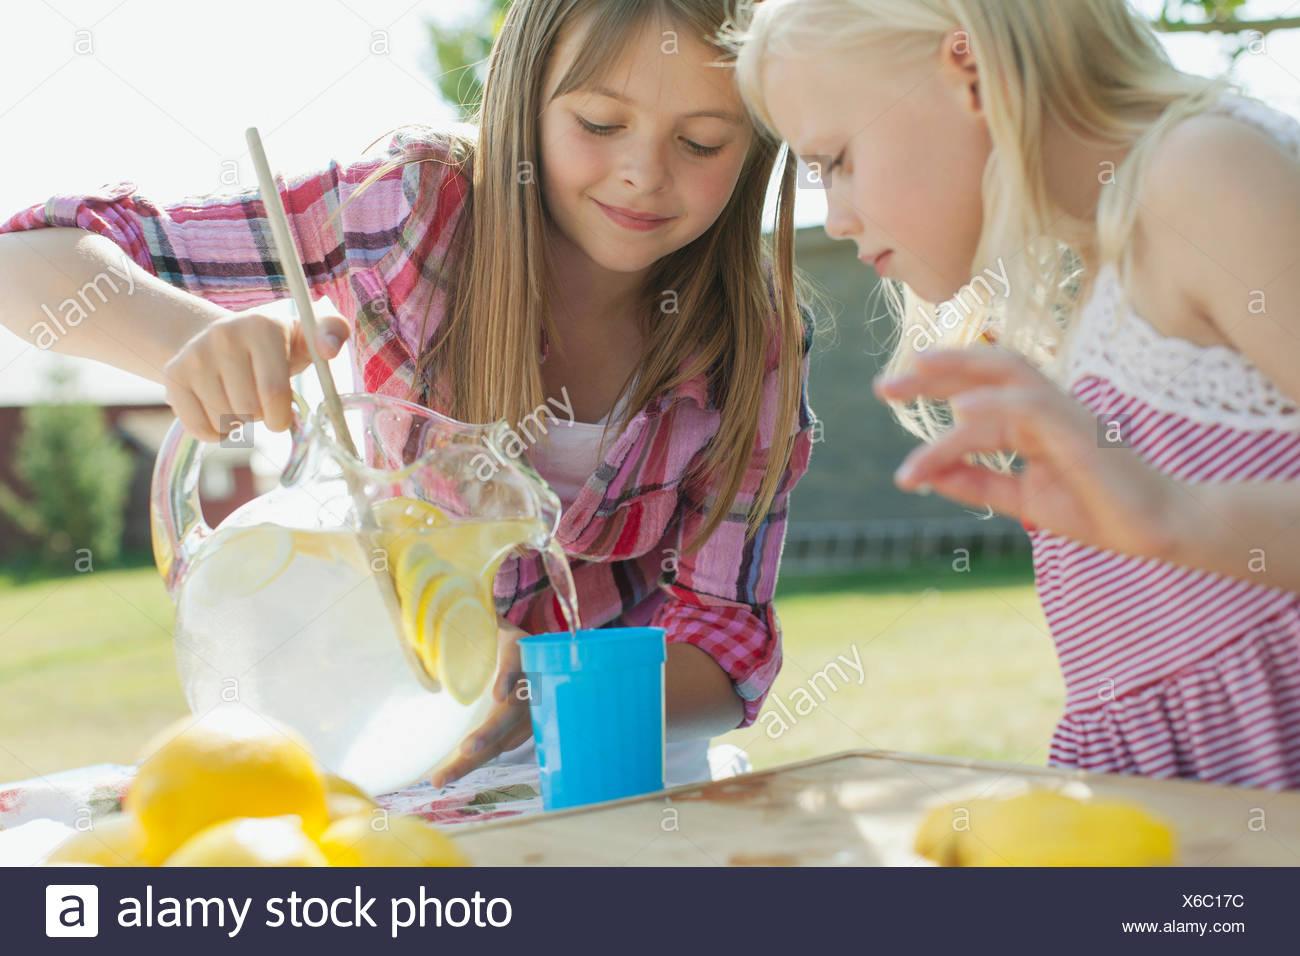 Sisters making lemonade together. - Stock Image